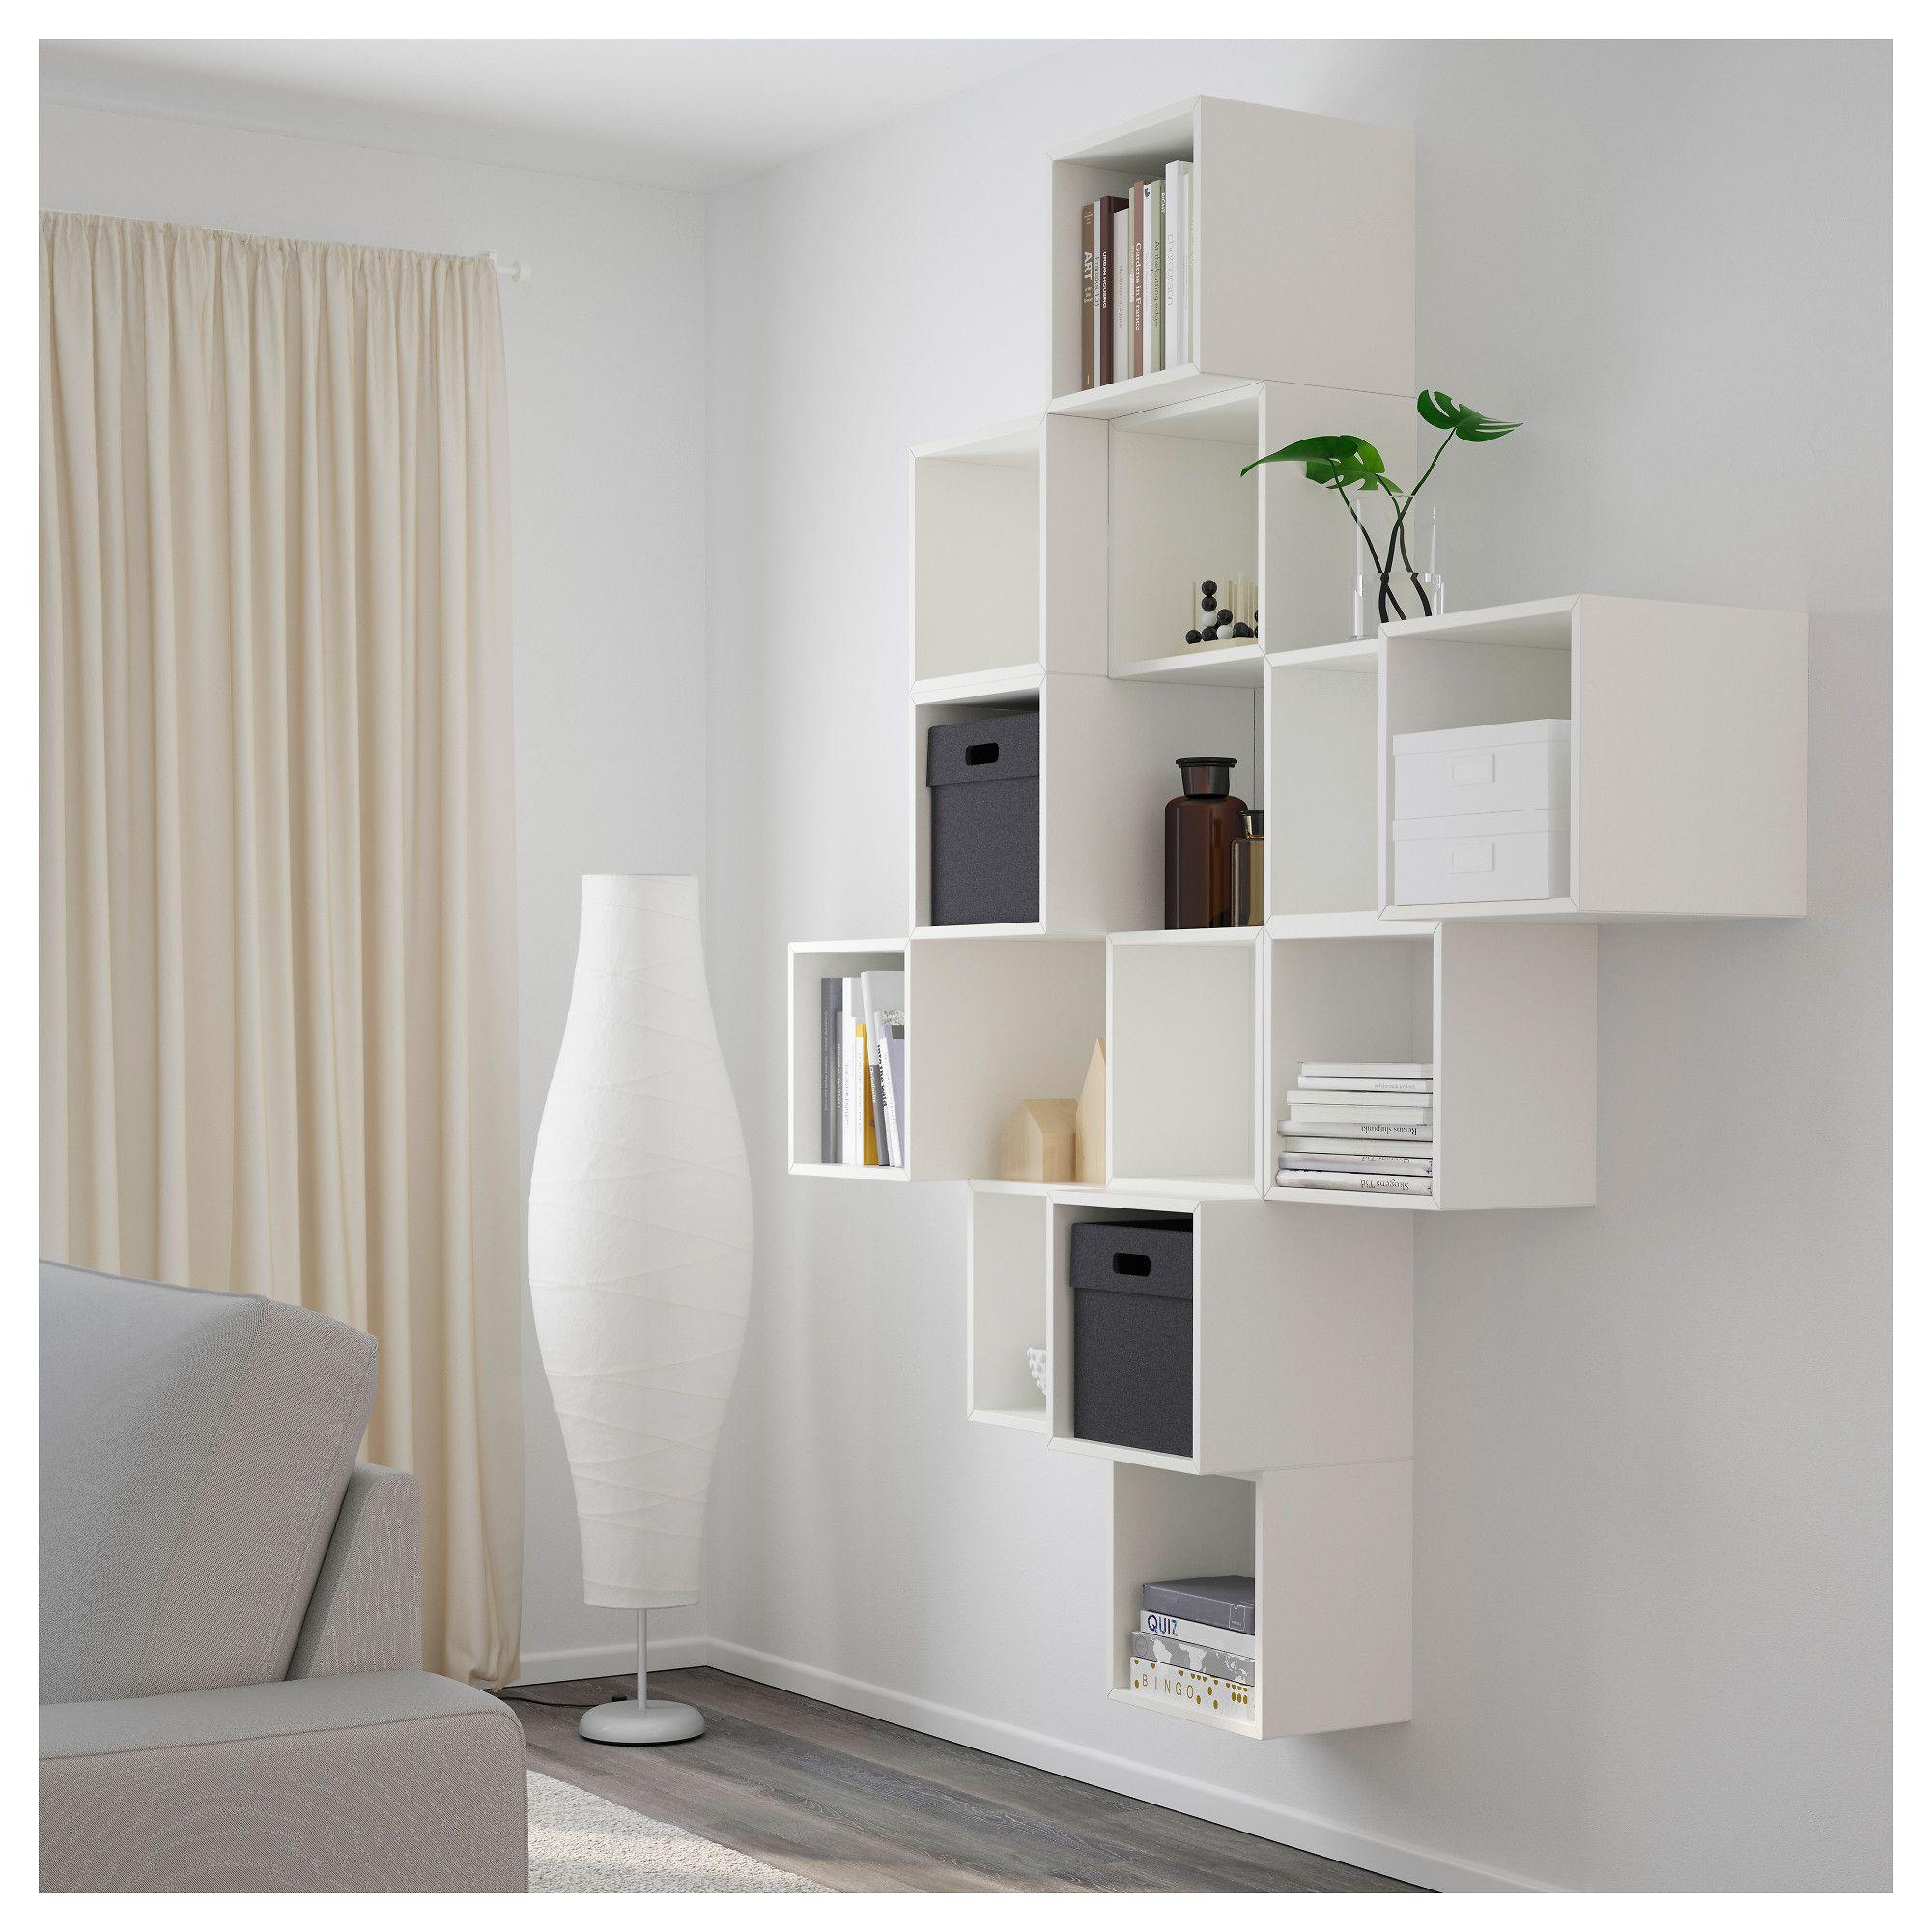 Libreria Da Parete Ikea eket wall-mounted cabinet combination - white 68 7/8x13 3